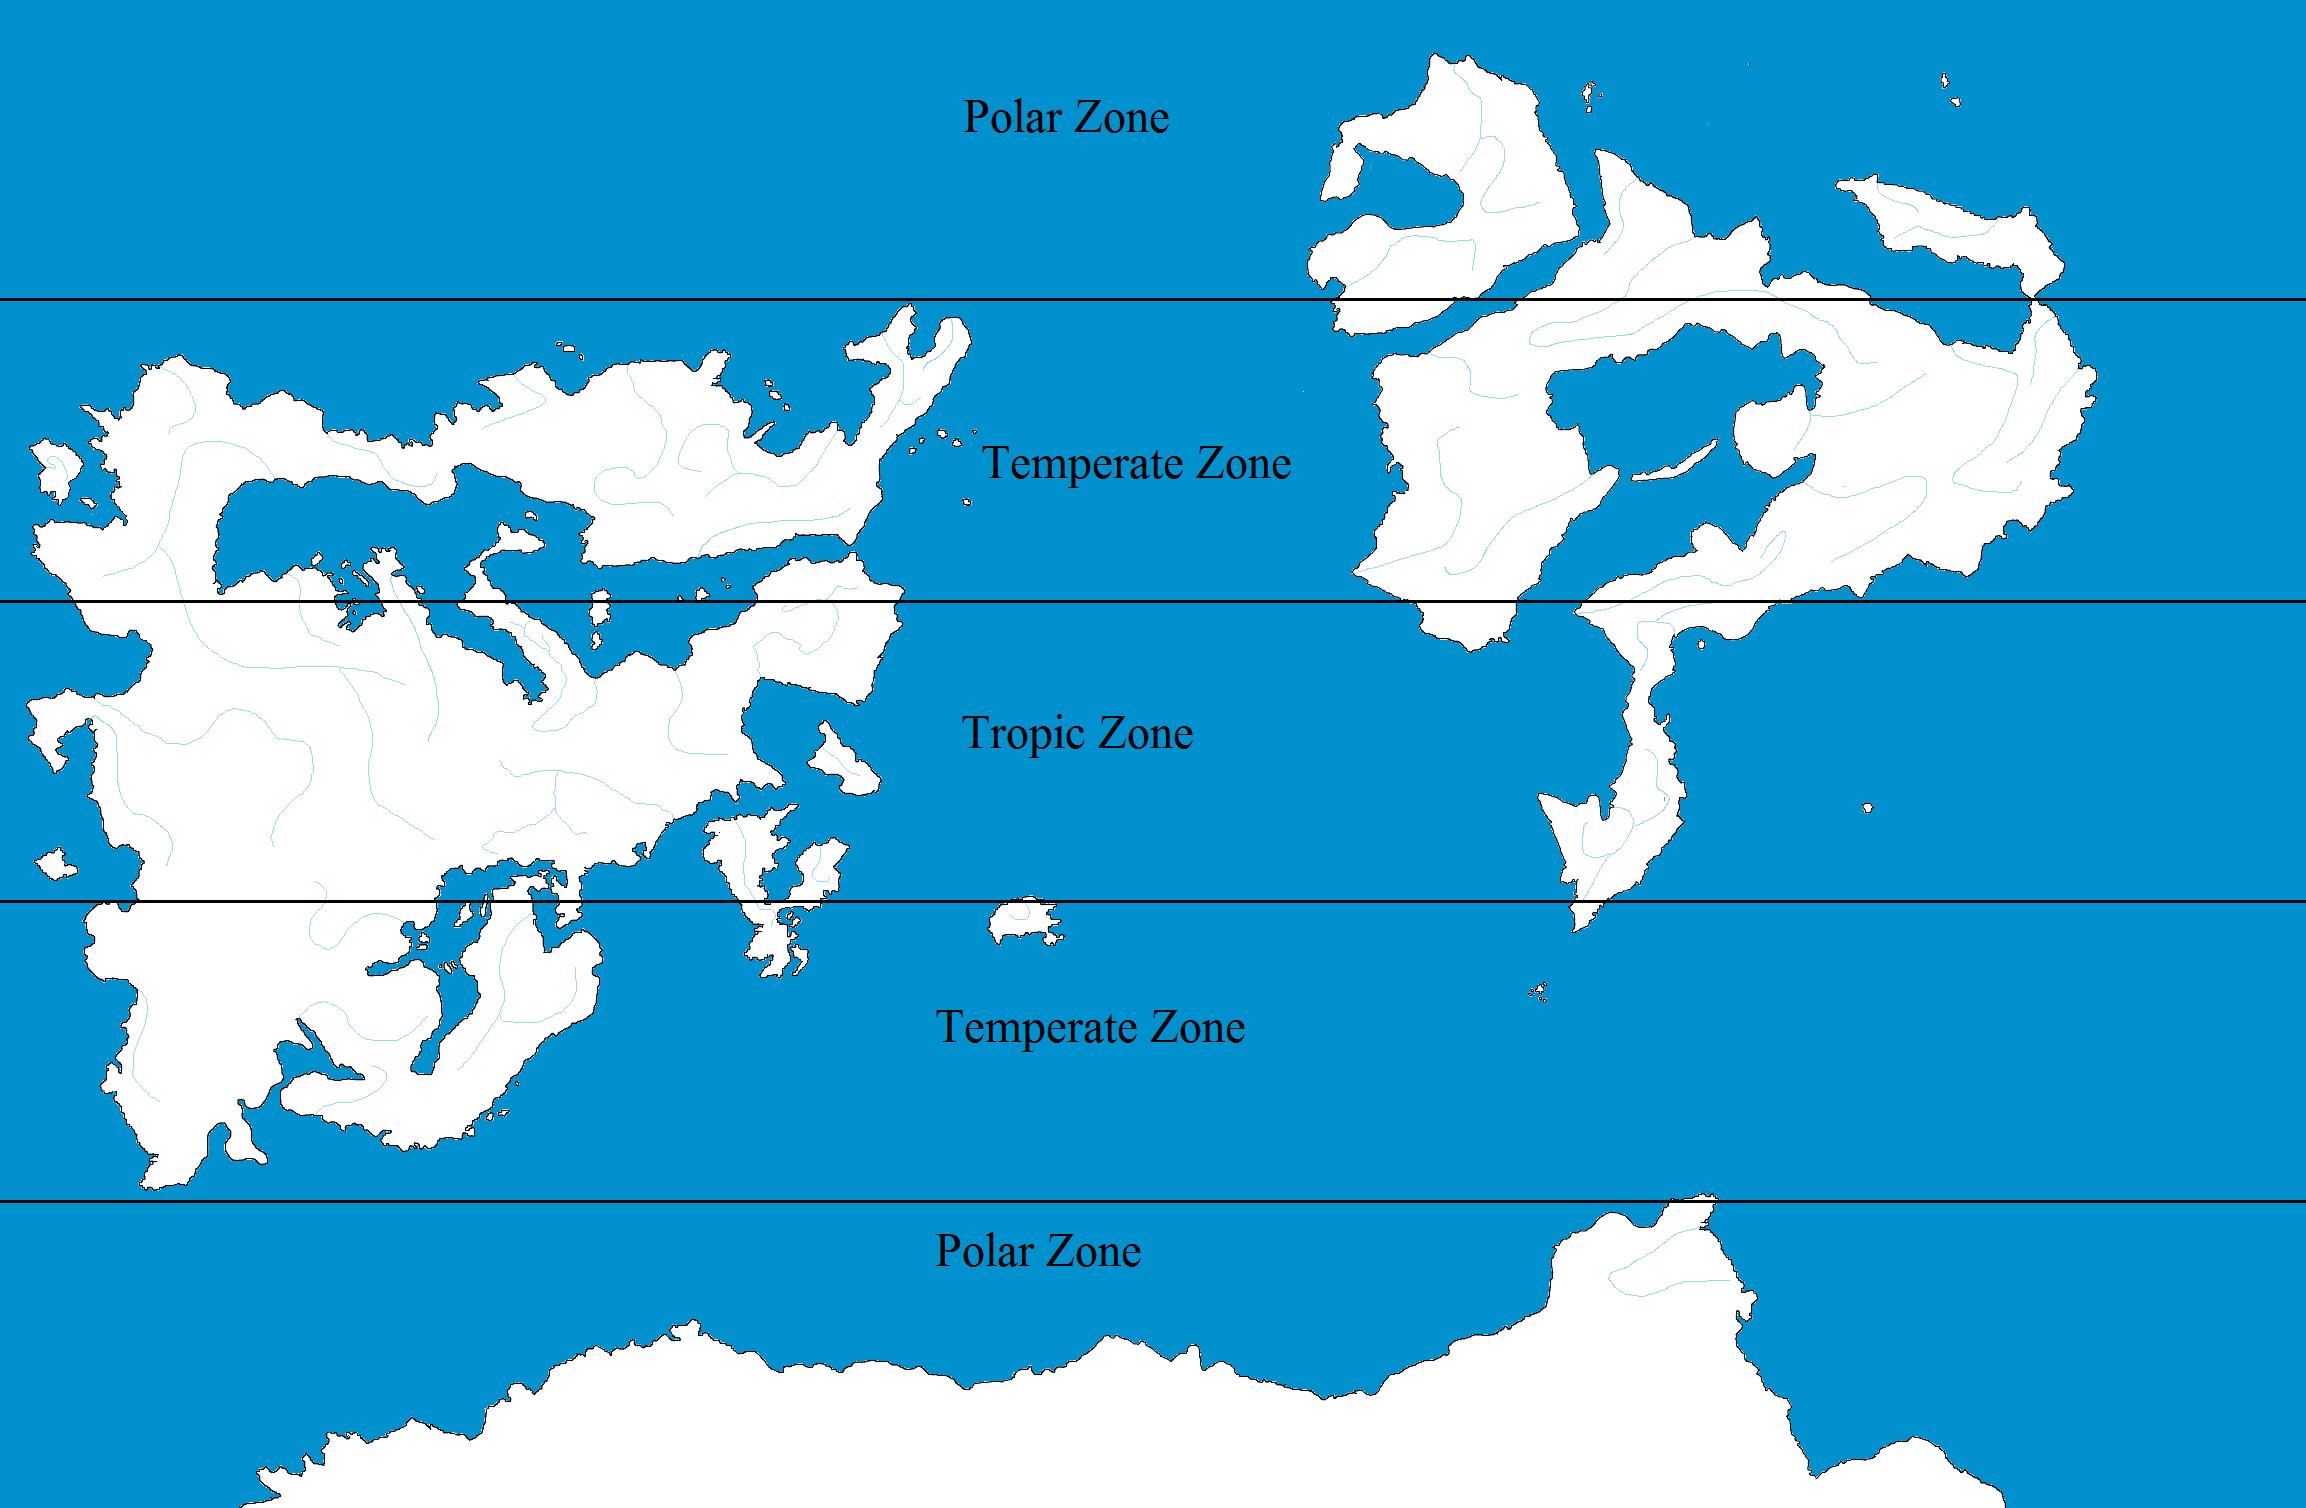 Free Worksheet Climate Zones Worksheet climate worksheet images for world zones